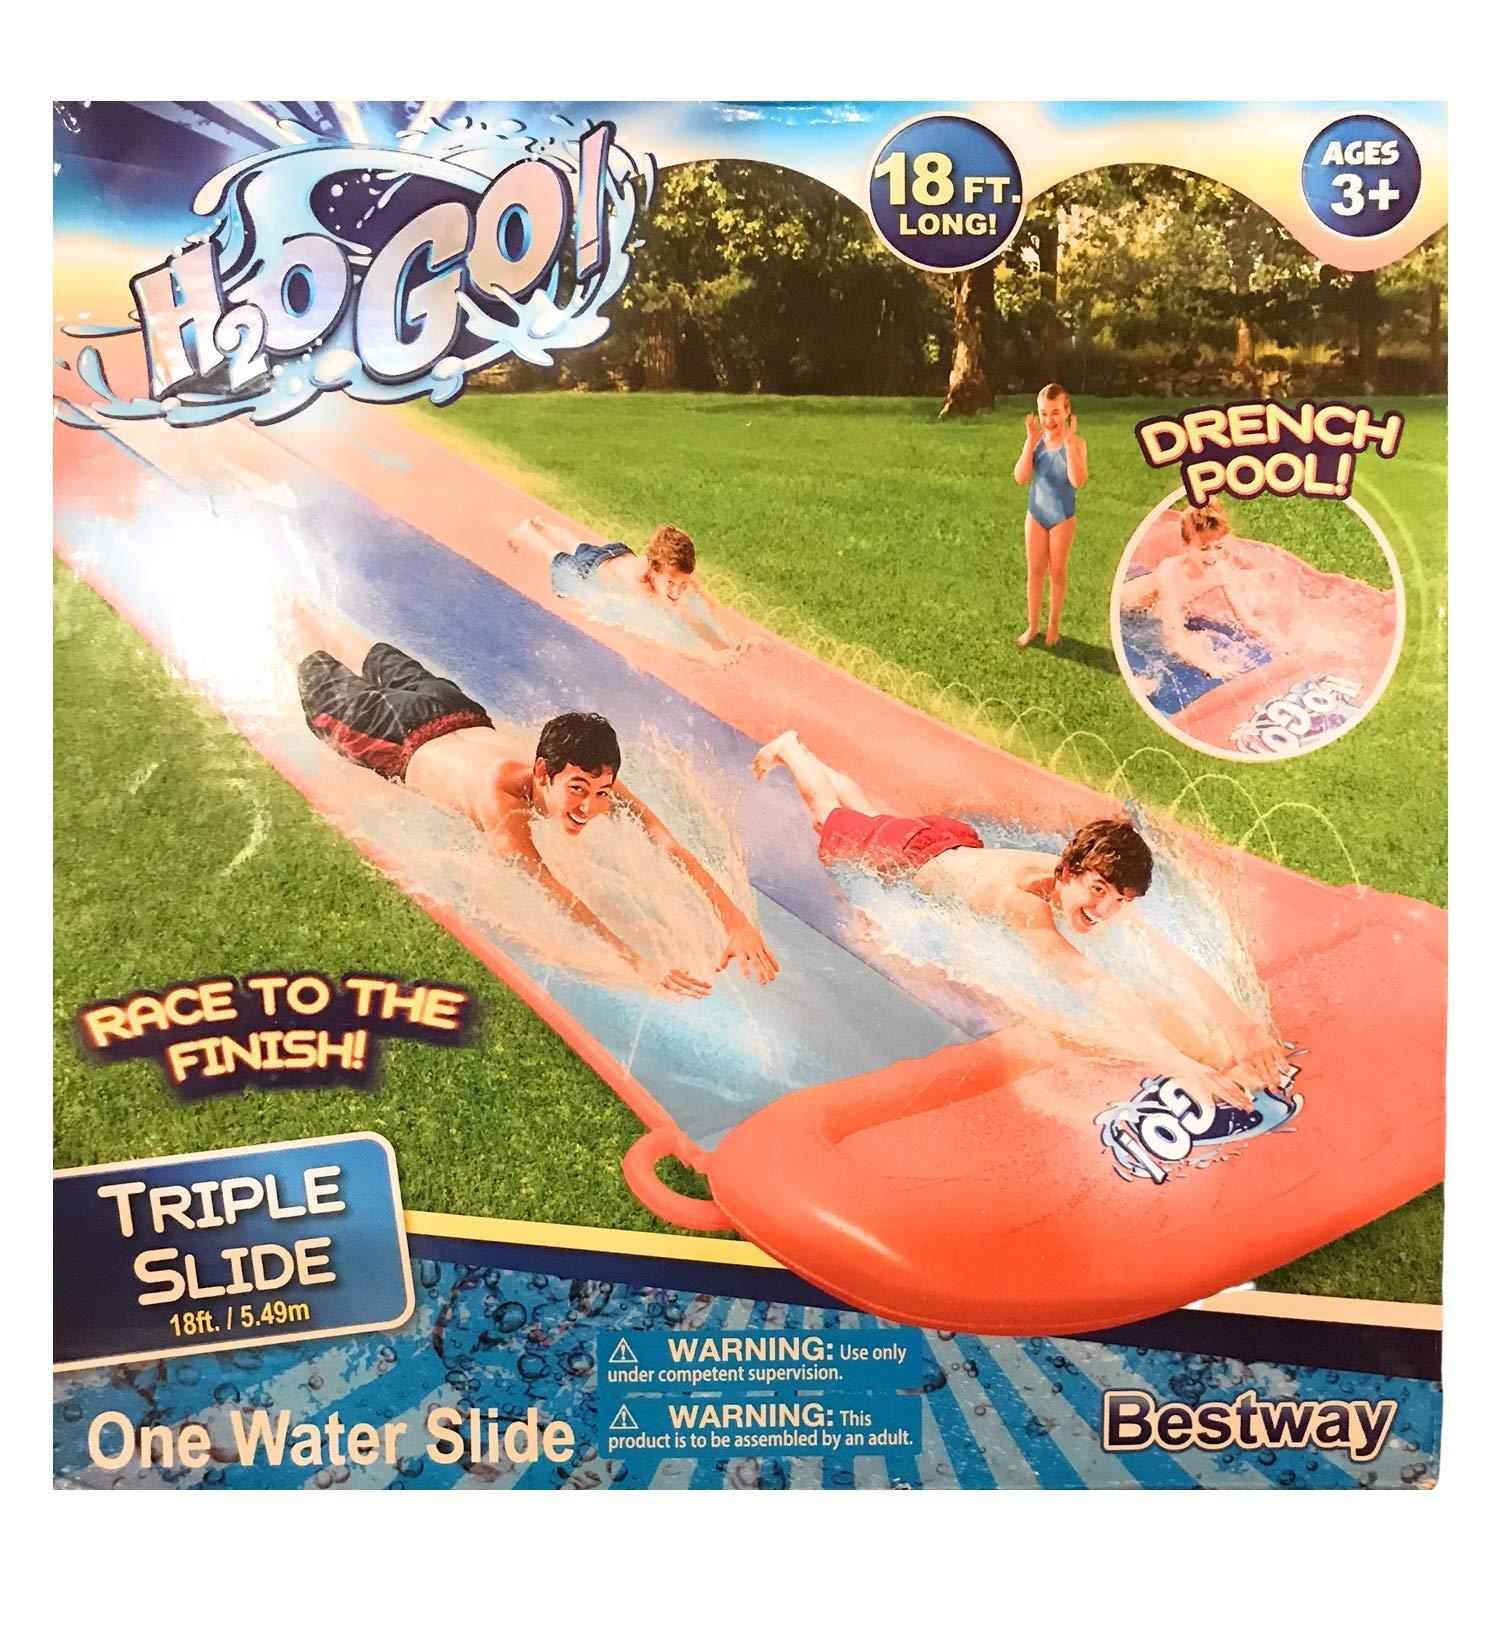 H2OGo 18' Long Triple Water Slide Including Drench Pool by H2OGo